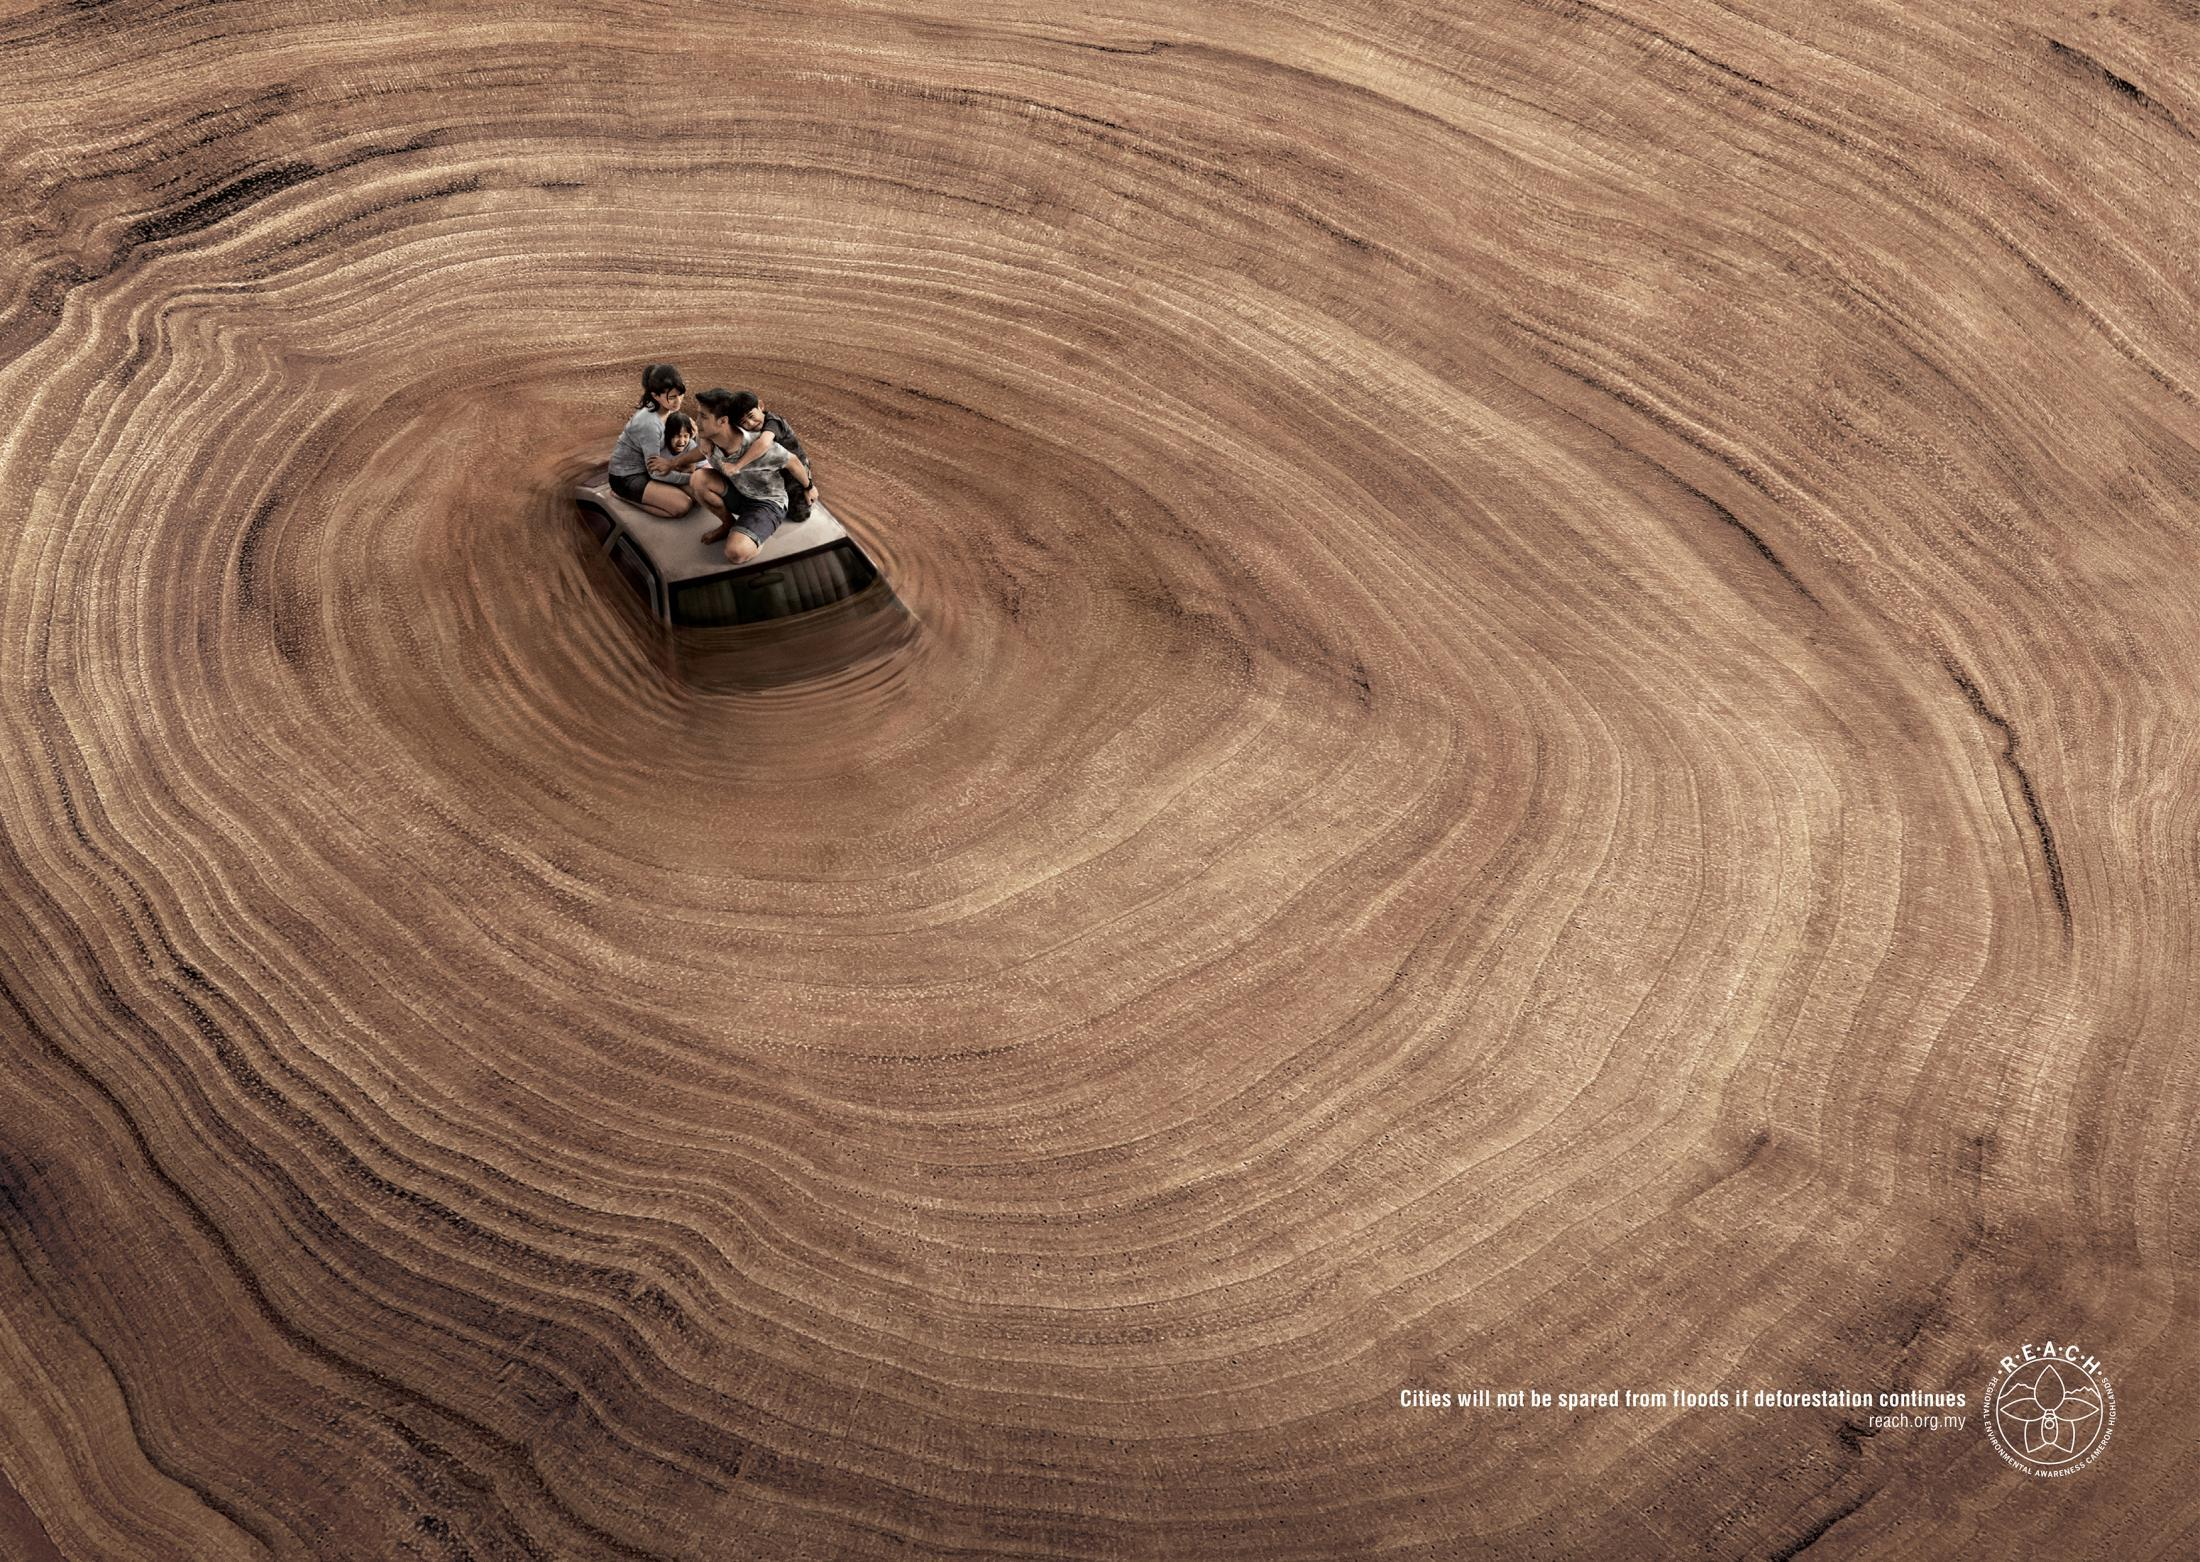 Regional Environmental Awareness Cameron Highlands Print Ad - Family